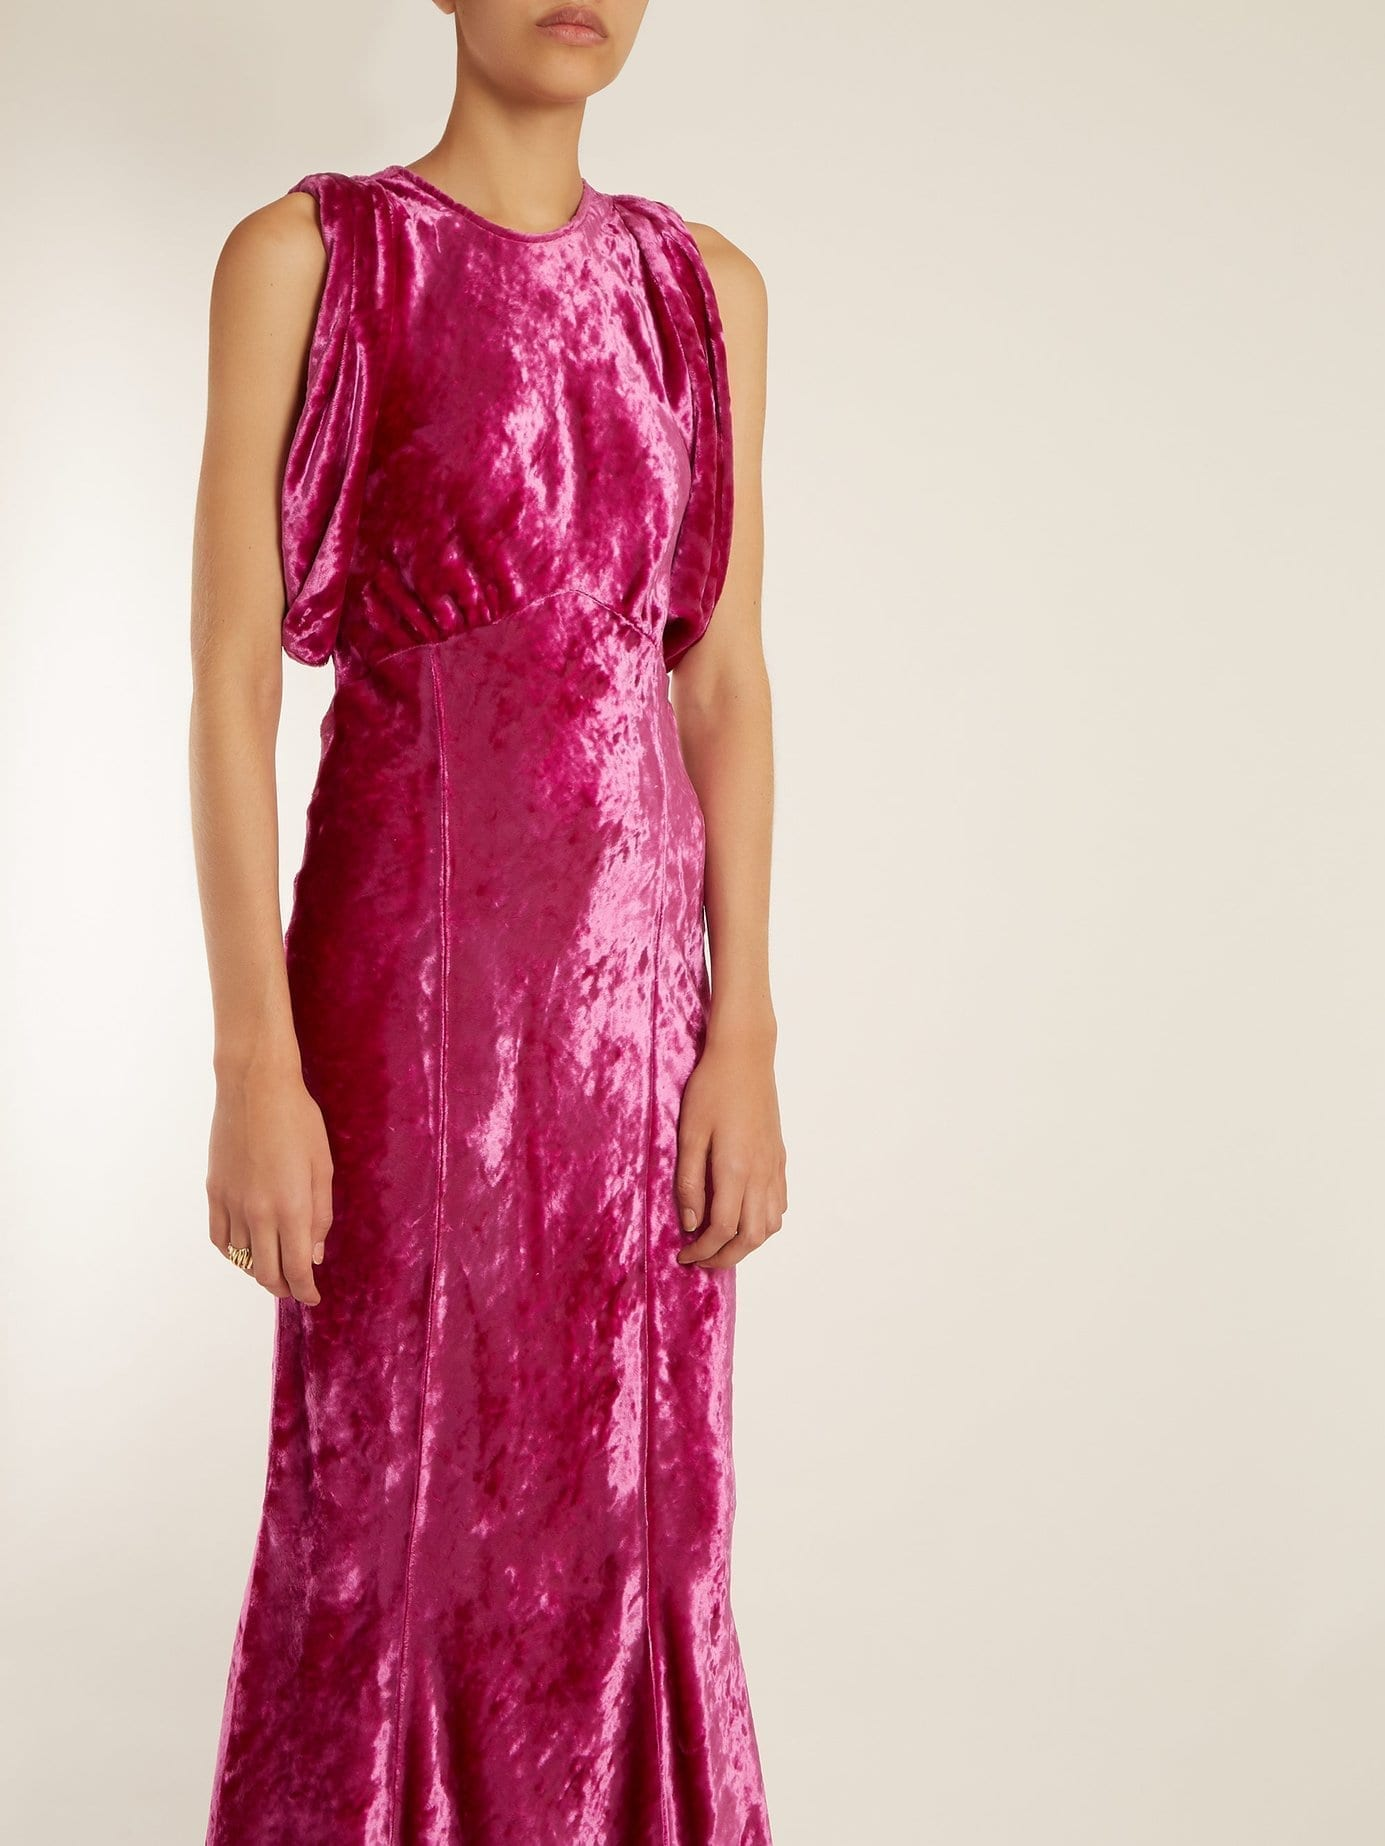 Attico Draped Short Sleeved Ruched Velvet Hot Pink Dress